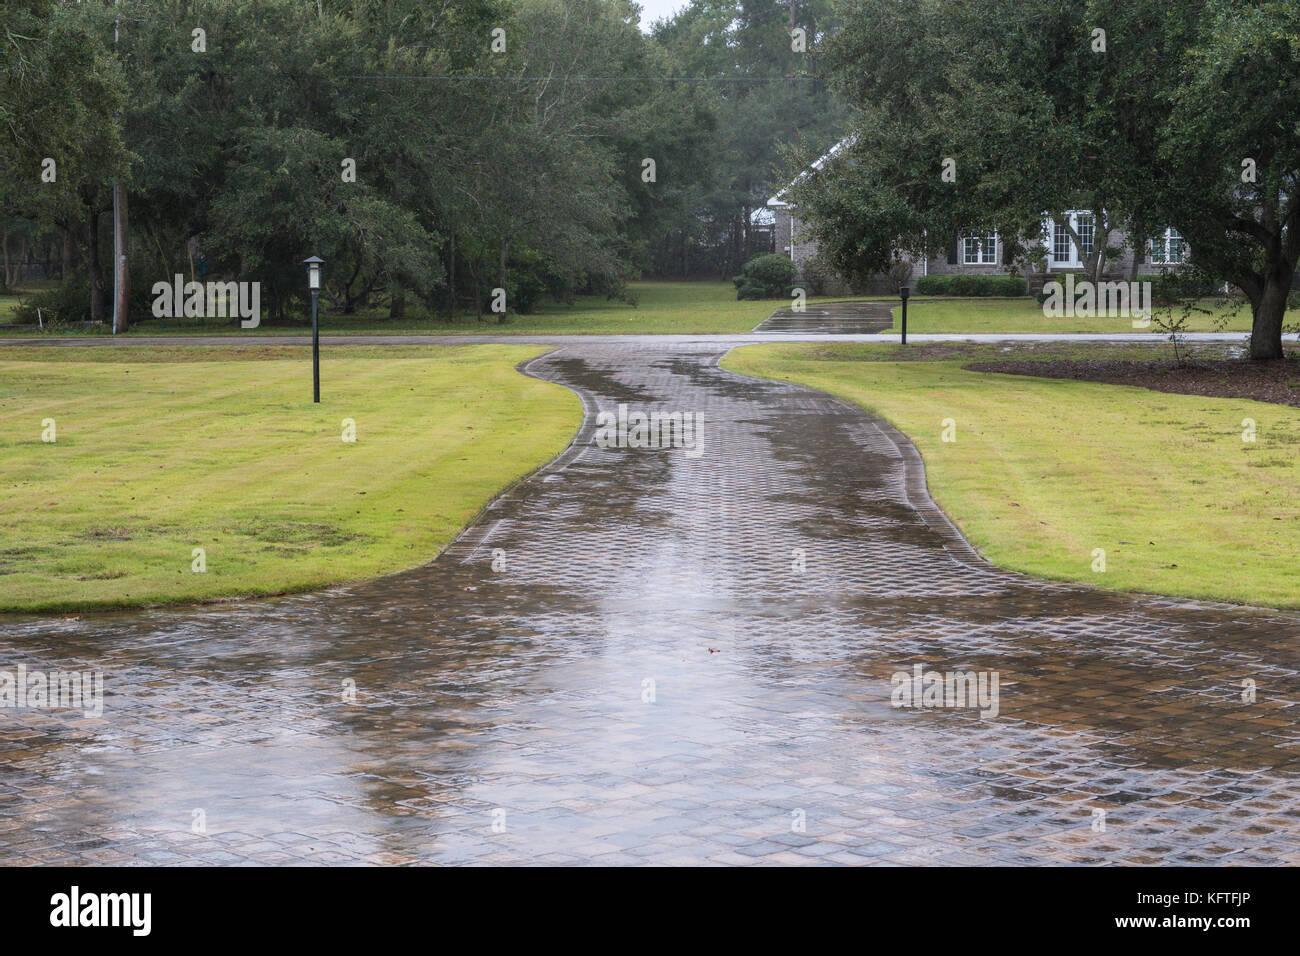 Wide Suburban Driveway in Rainstorm, SC, USA - Stock Image